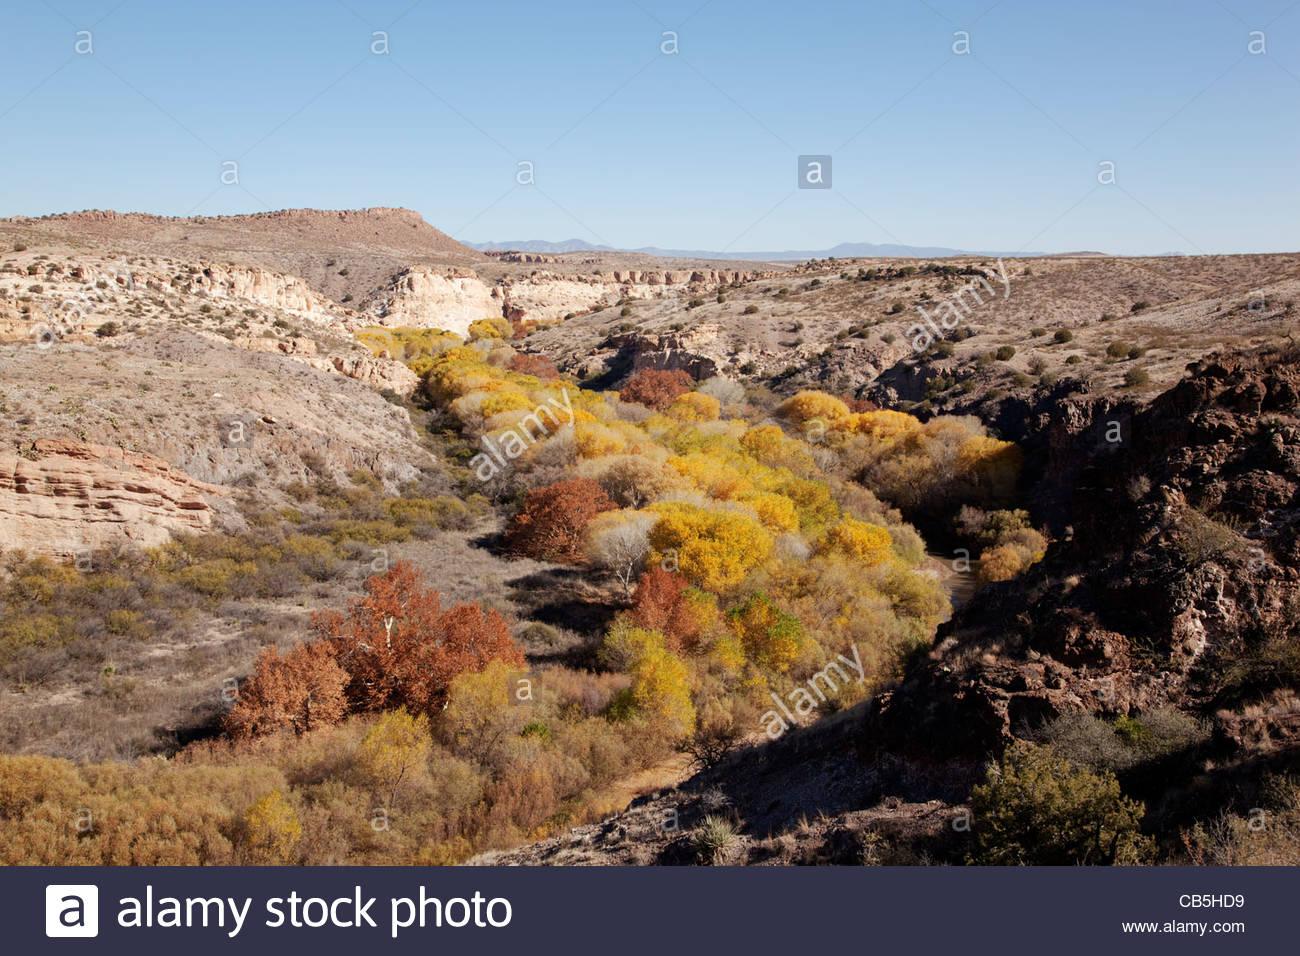 fall-colors-gila-lower-box-gila-river-new-mexico-CB5HD9.jpg